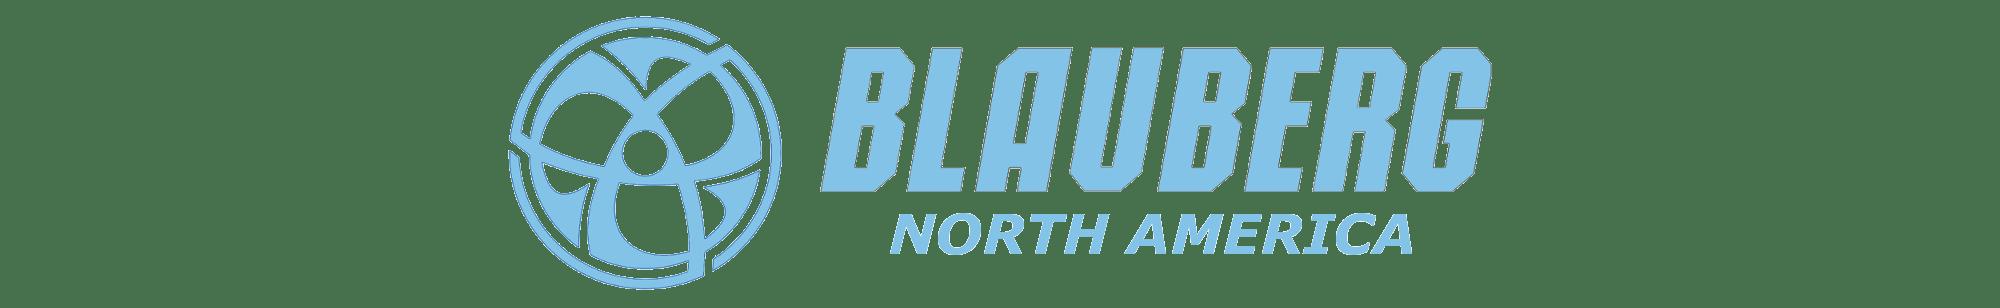 Blauberg-North-America-Web-Logo